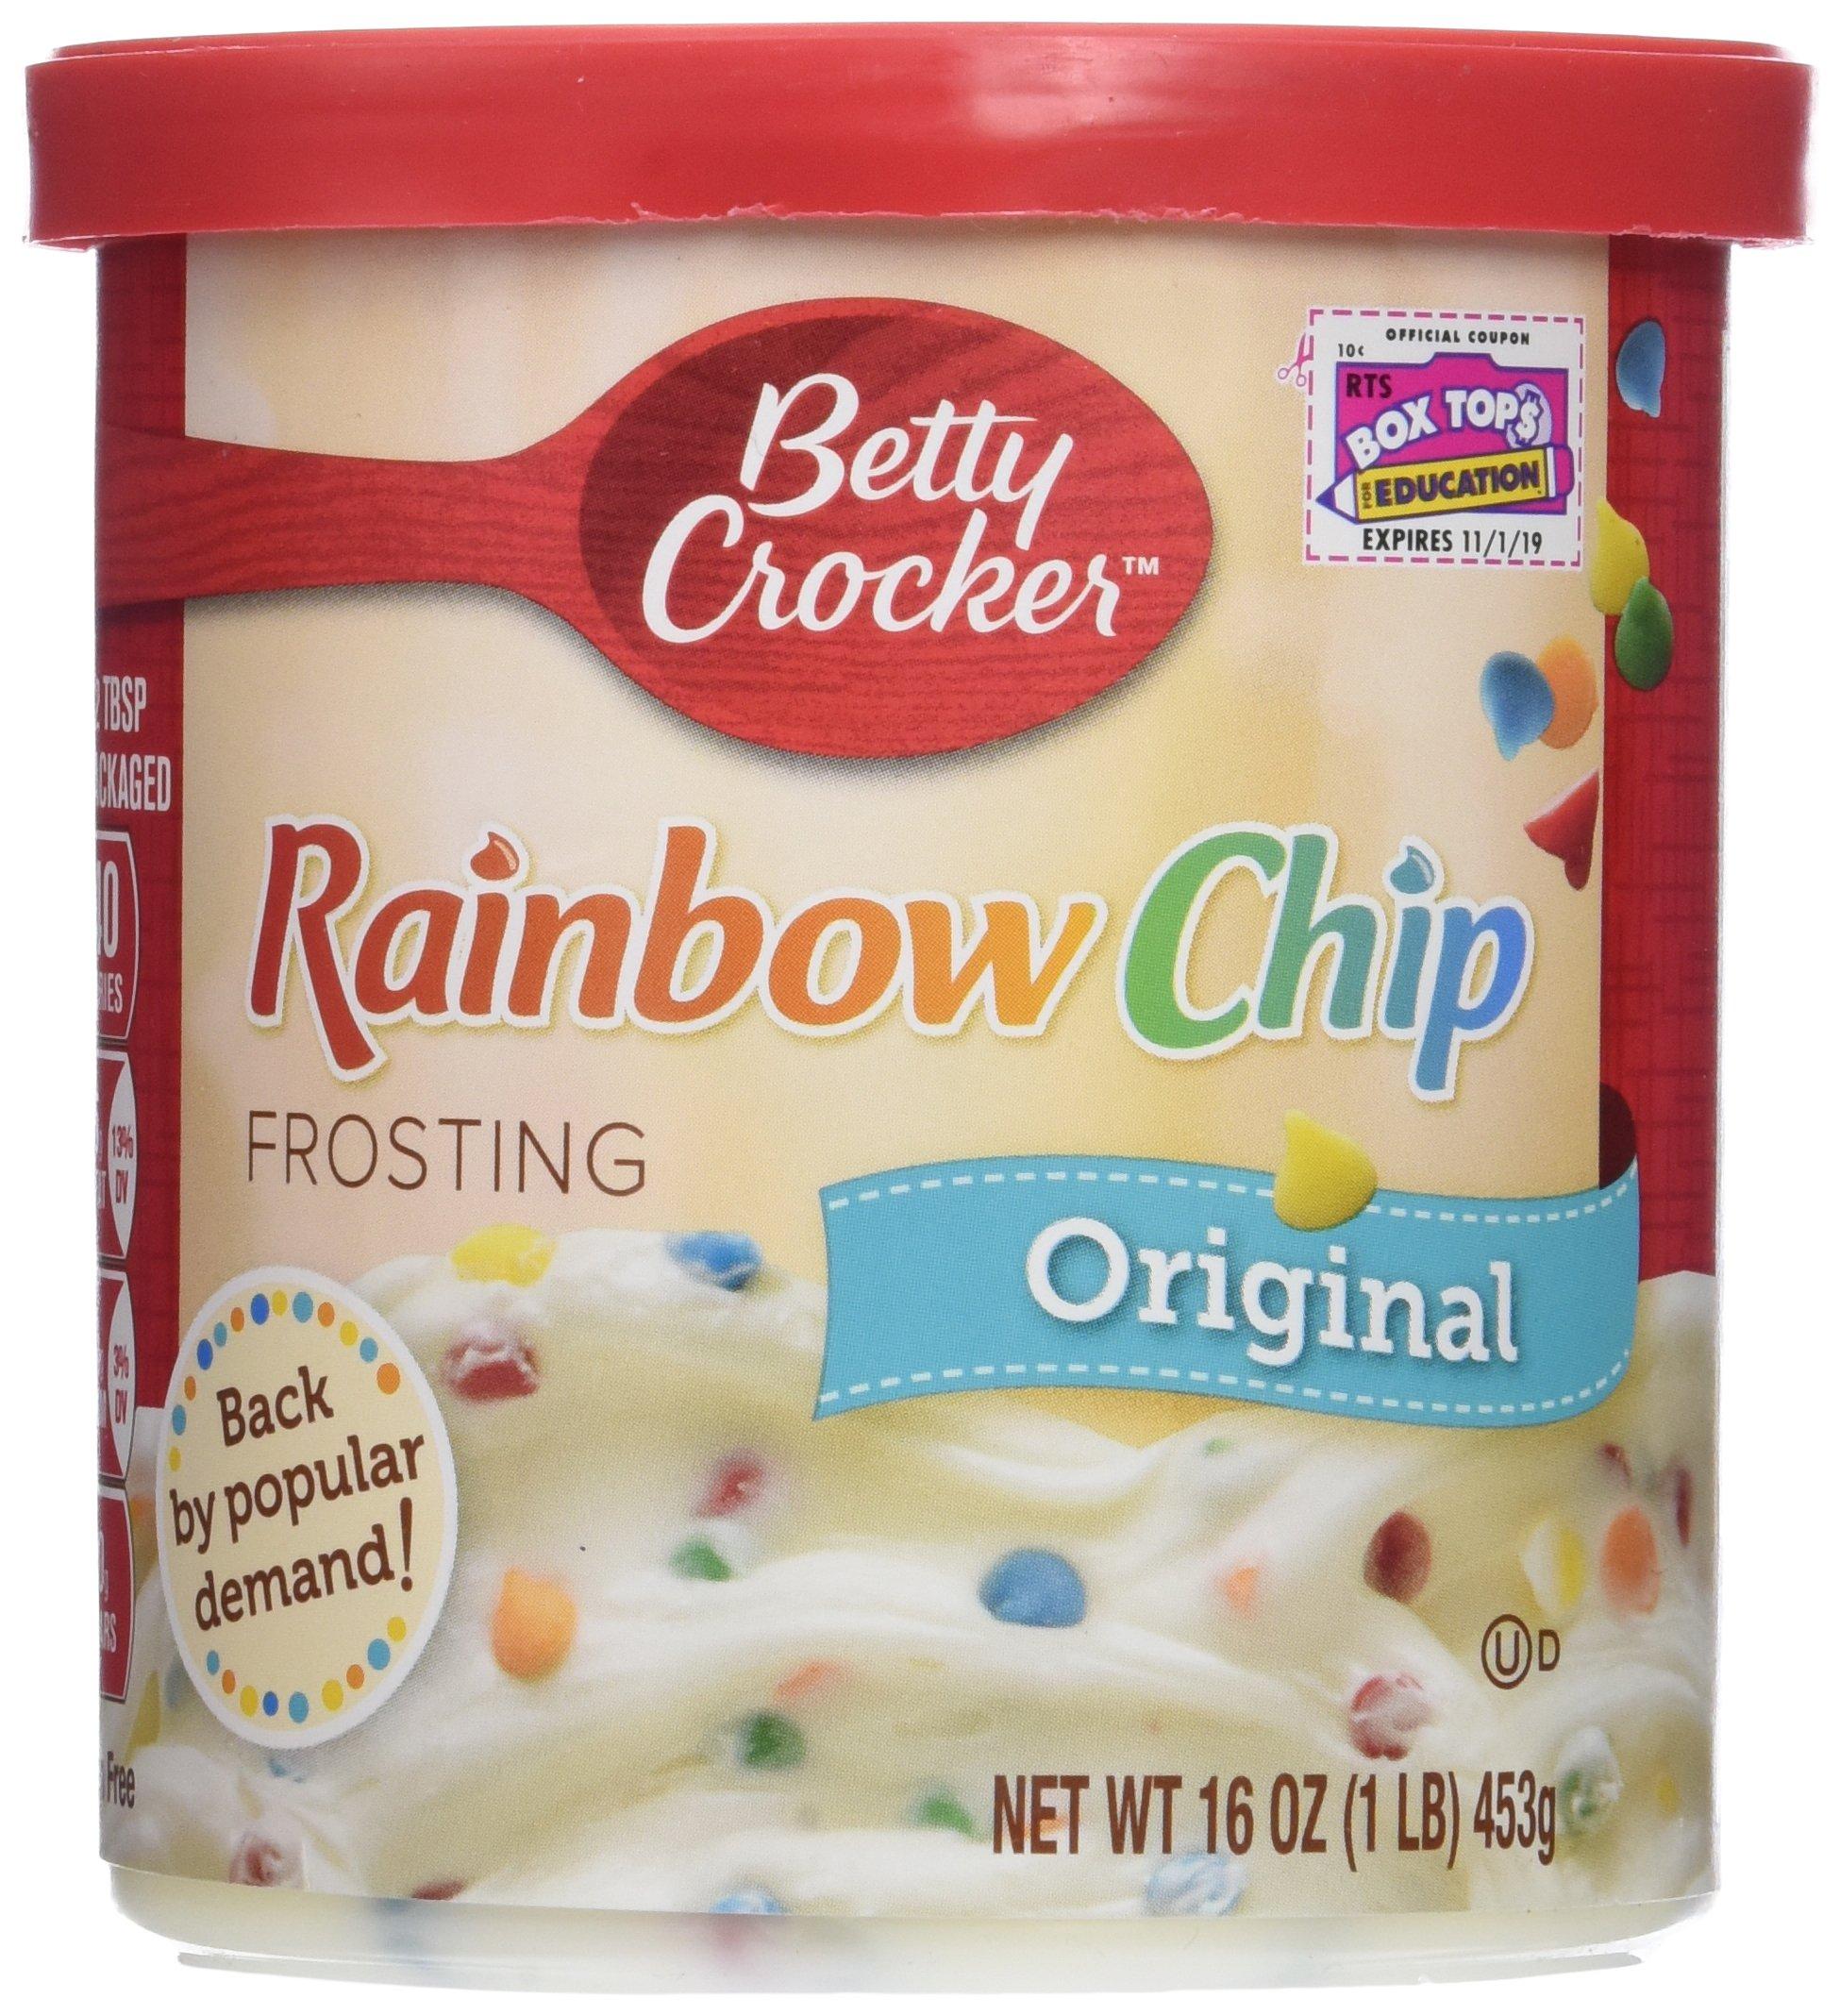 Betty Crocker, Rich & Creamy Frosting, Rainbow Chip, 16oz Tub (Pack of 3)